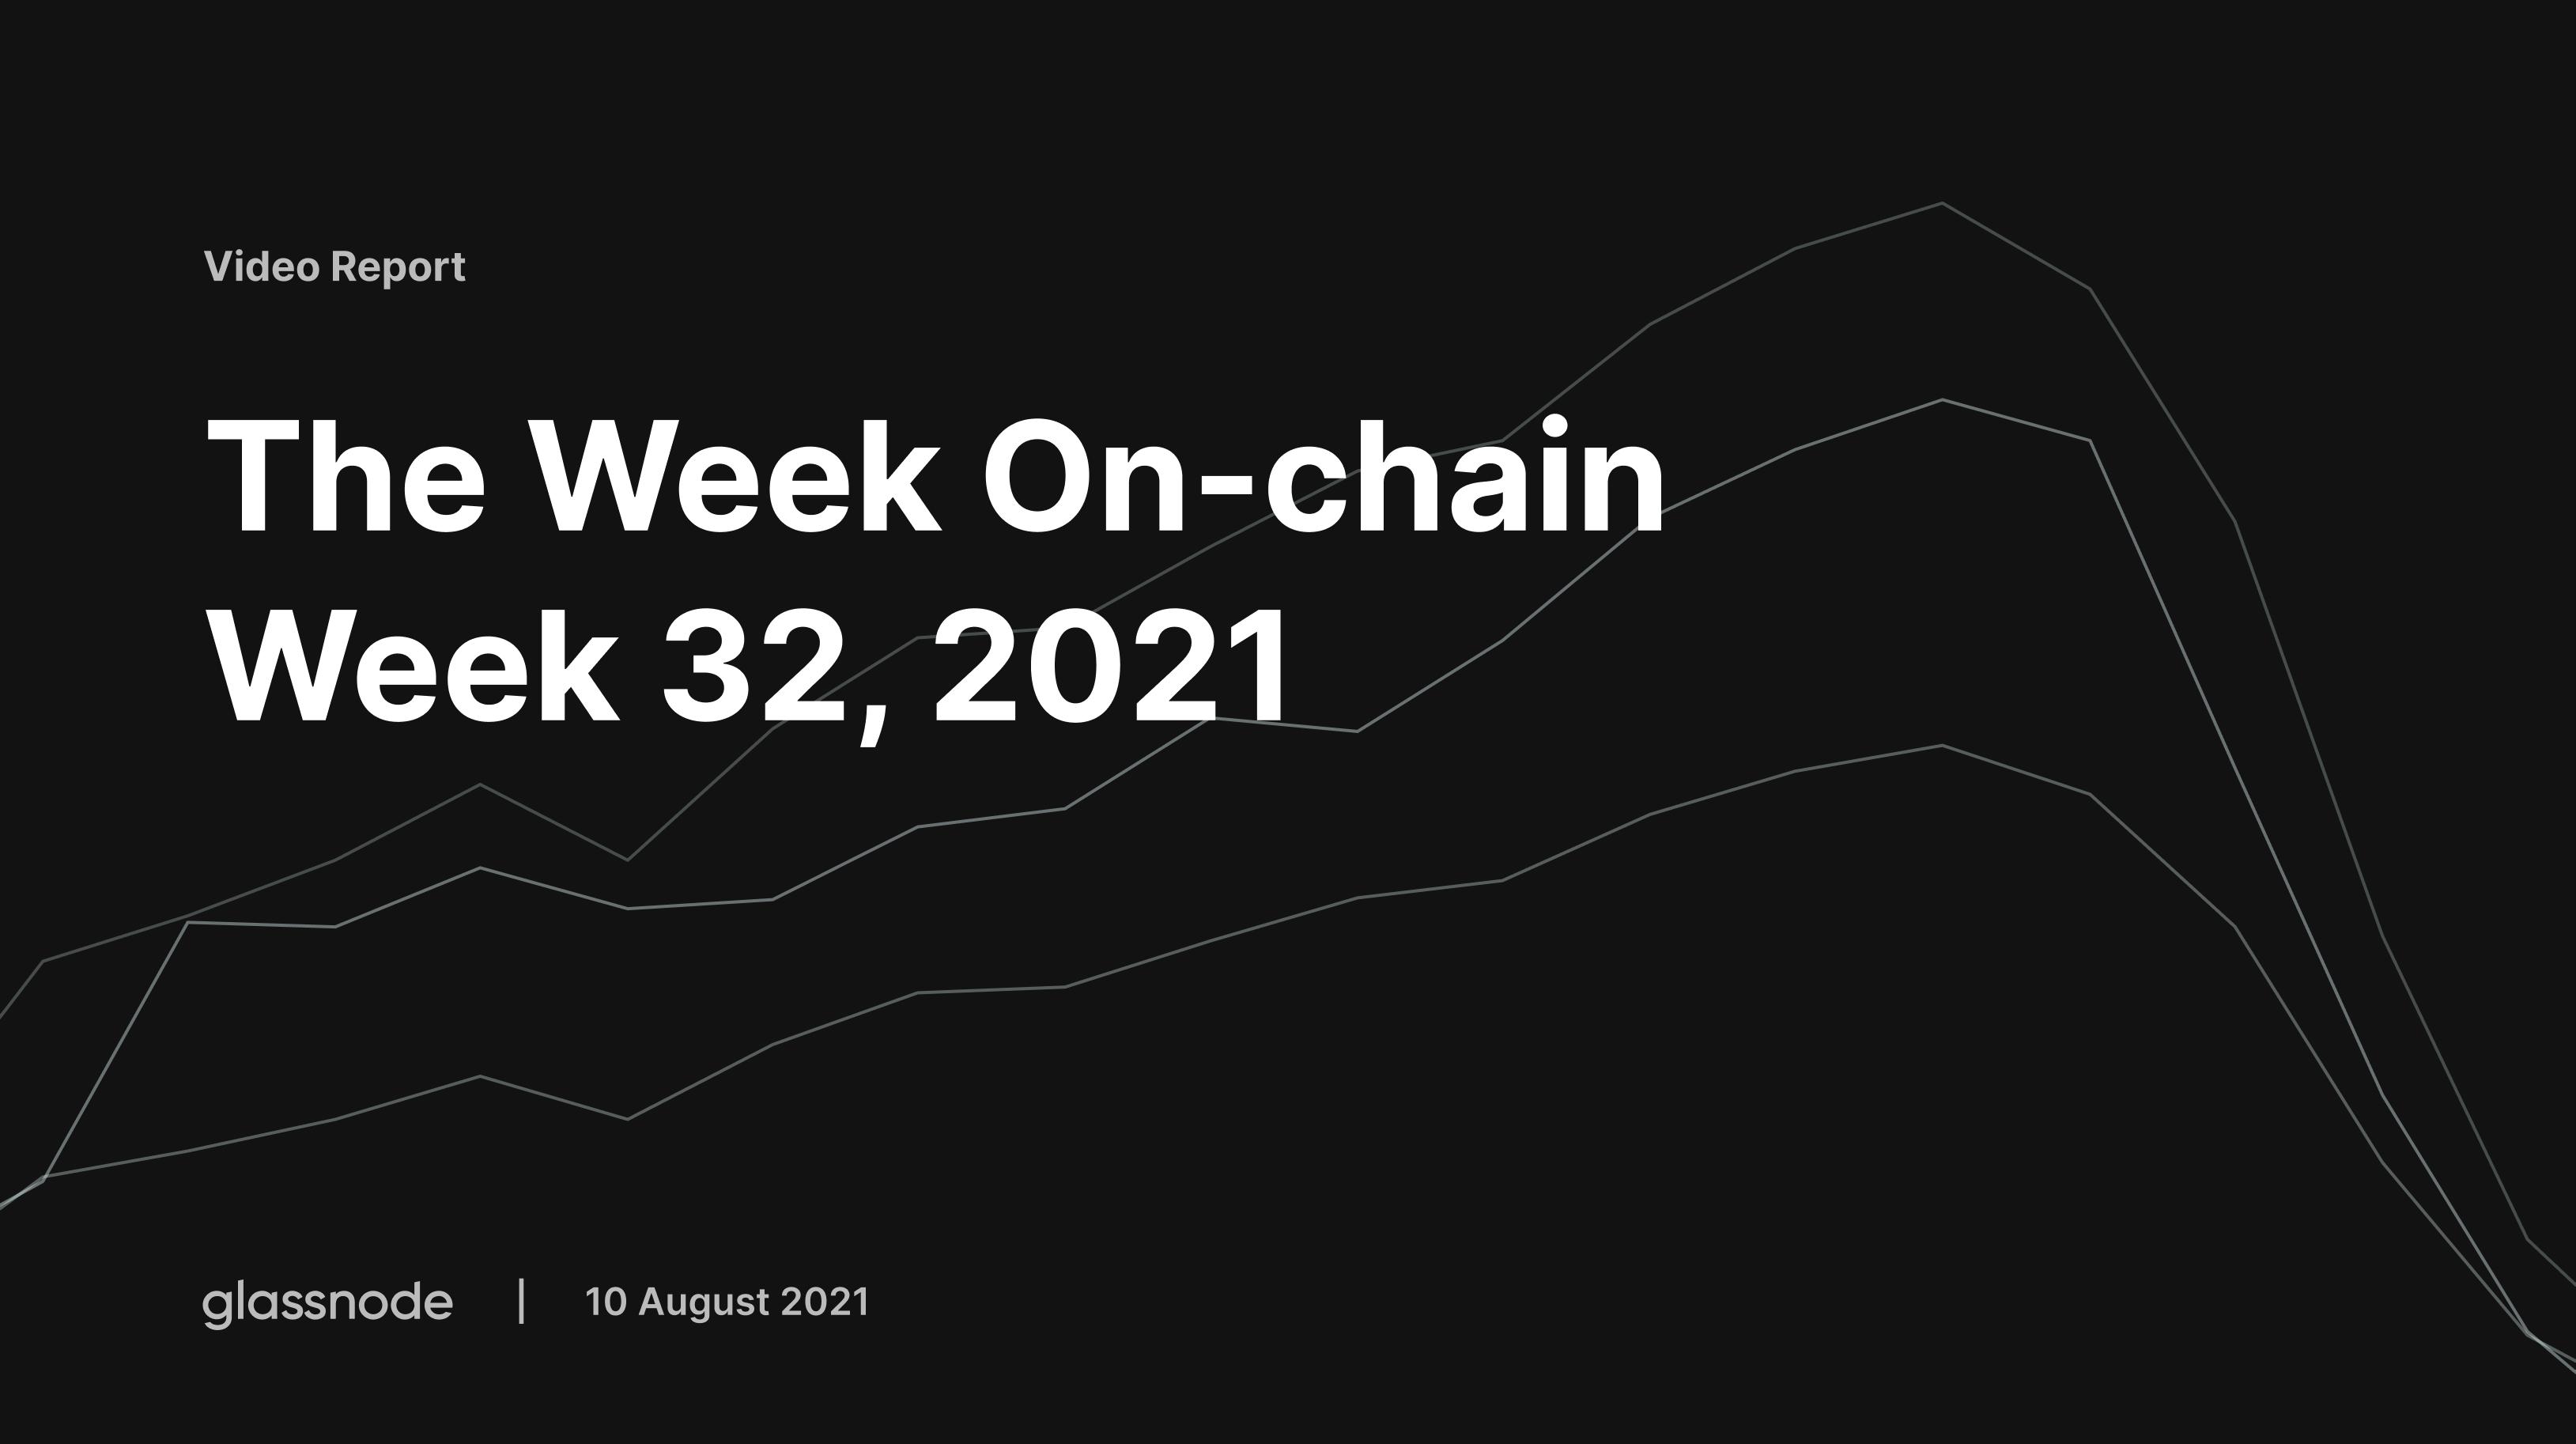 The Week On-chain (Week 33, 2021)